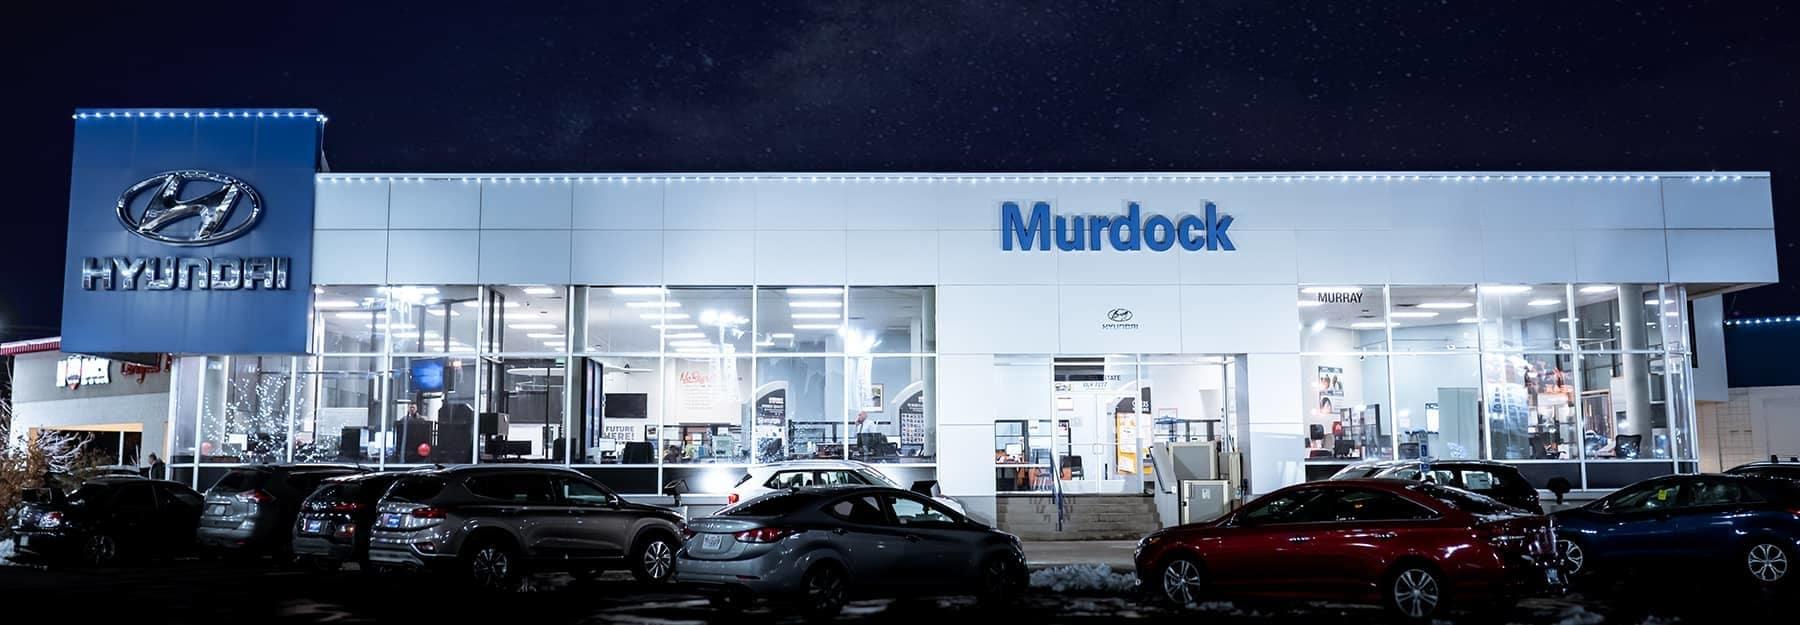 Murdock Hyundai Murray - Dealer Inspire